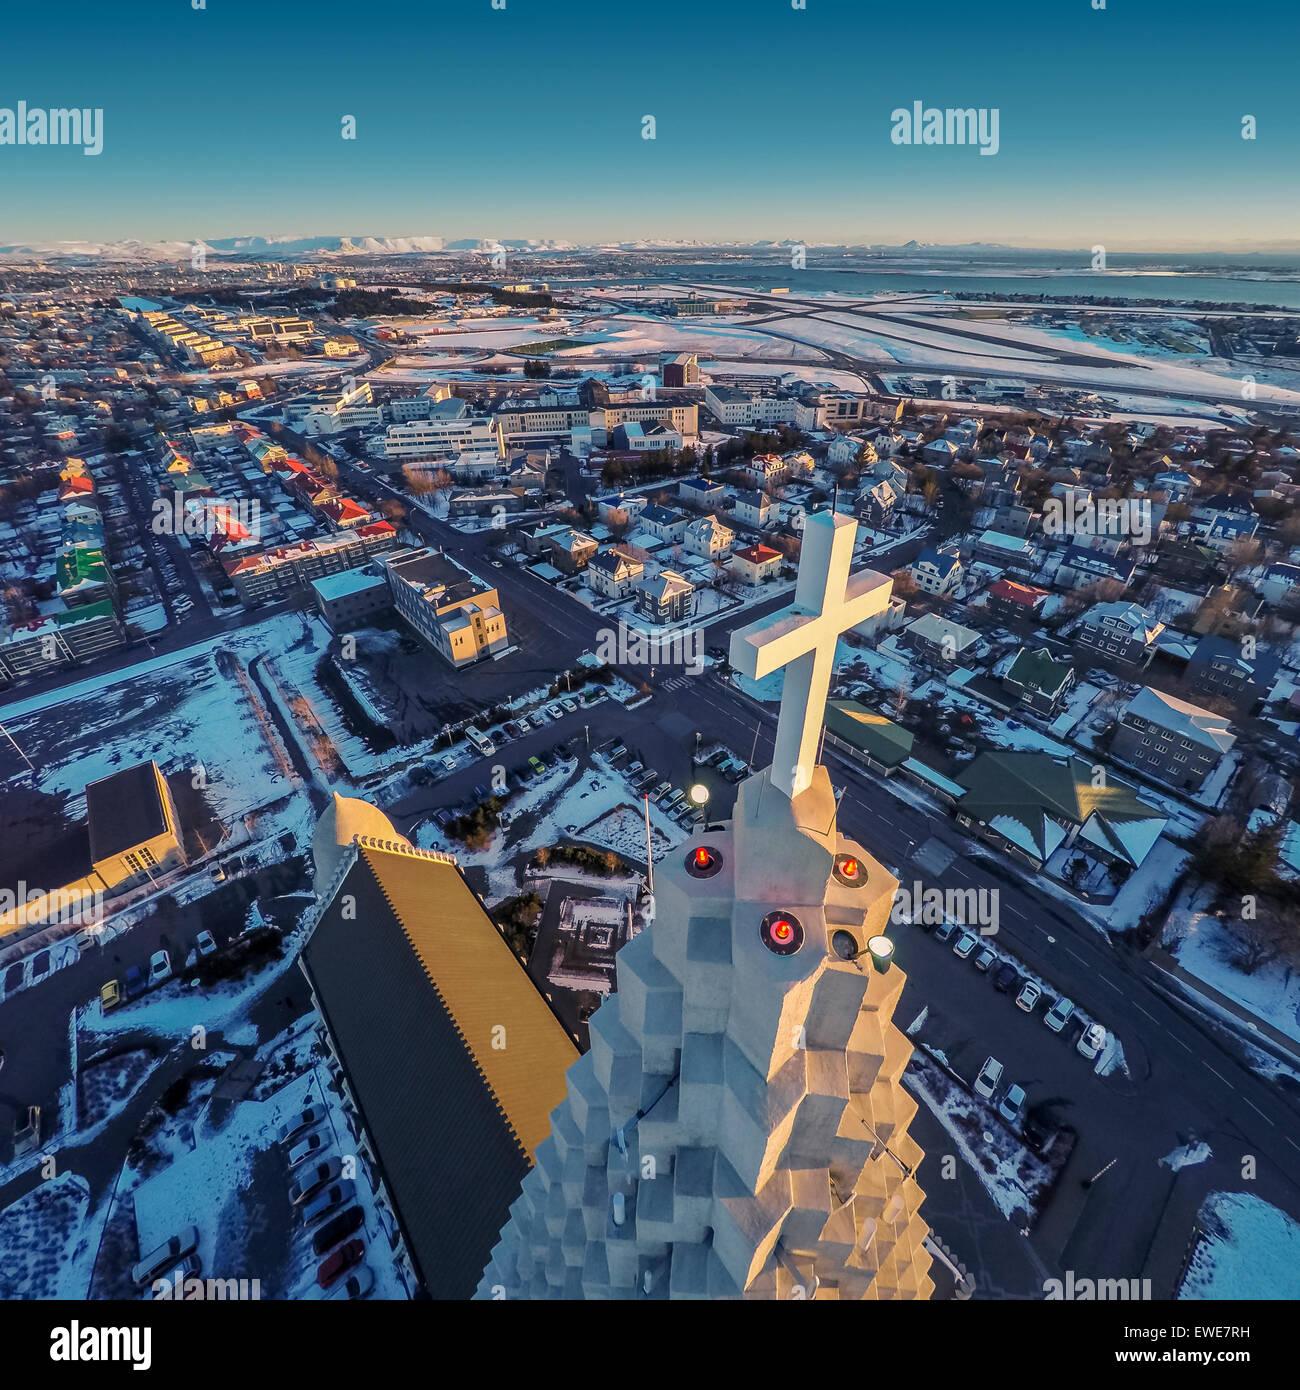 Hallgrimskirkja Church and Reykjavik, image produced using a drone, Reykjavik, Iceland - Stock Image